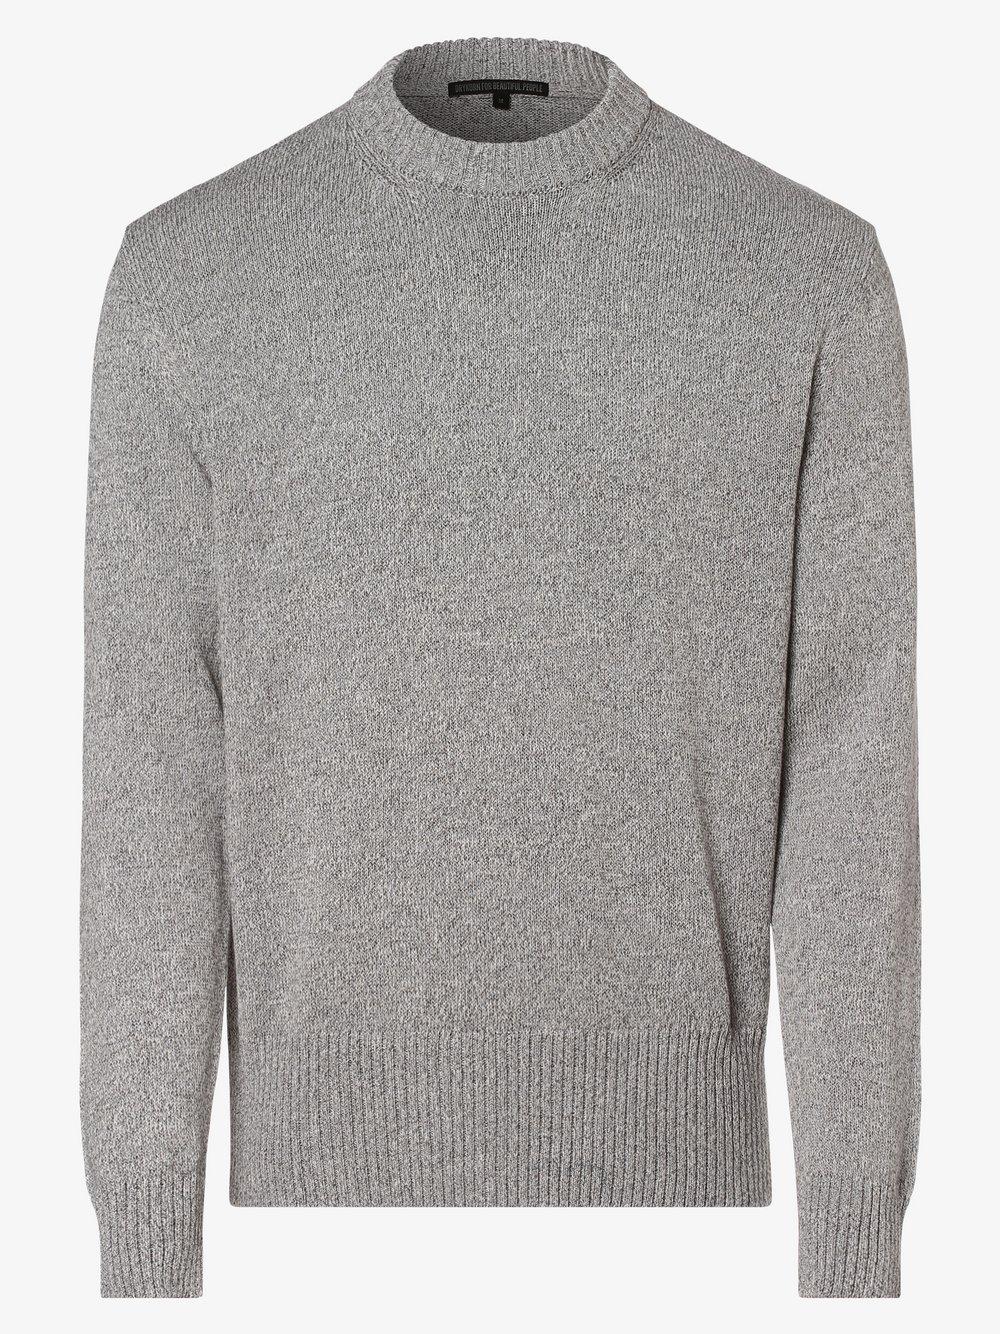 Drykorn - Sweter męski – Vincent, szary